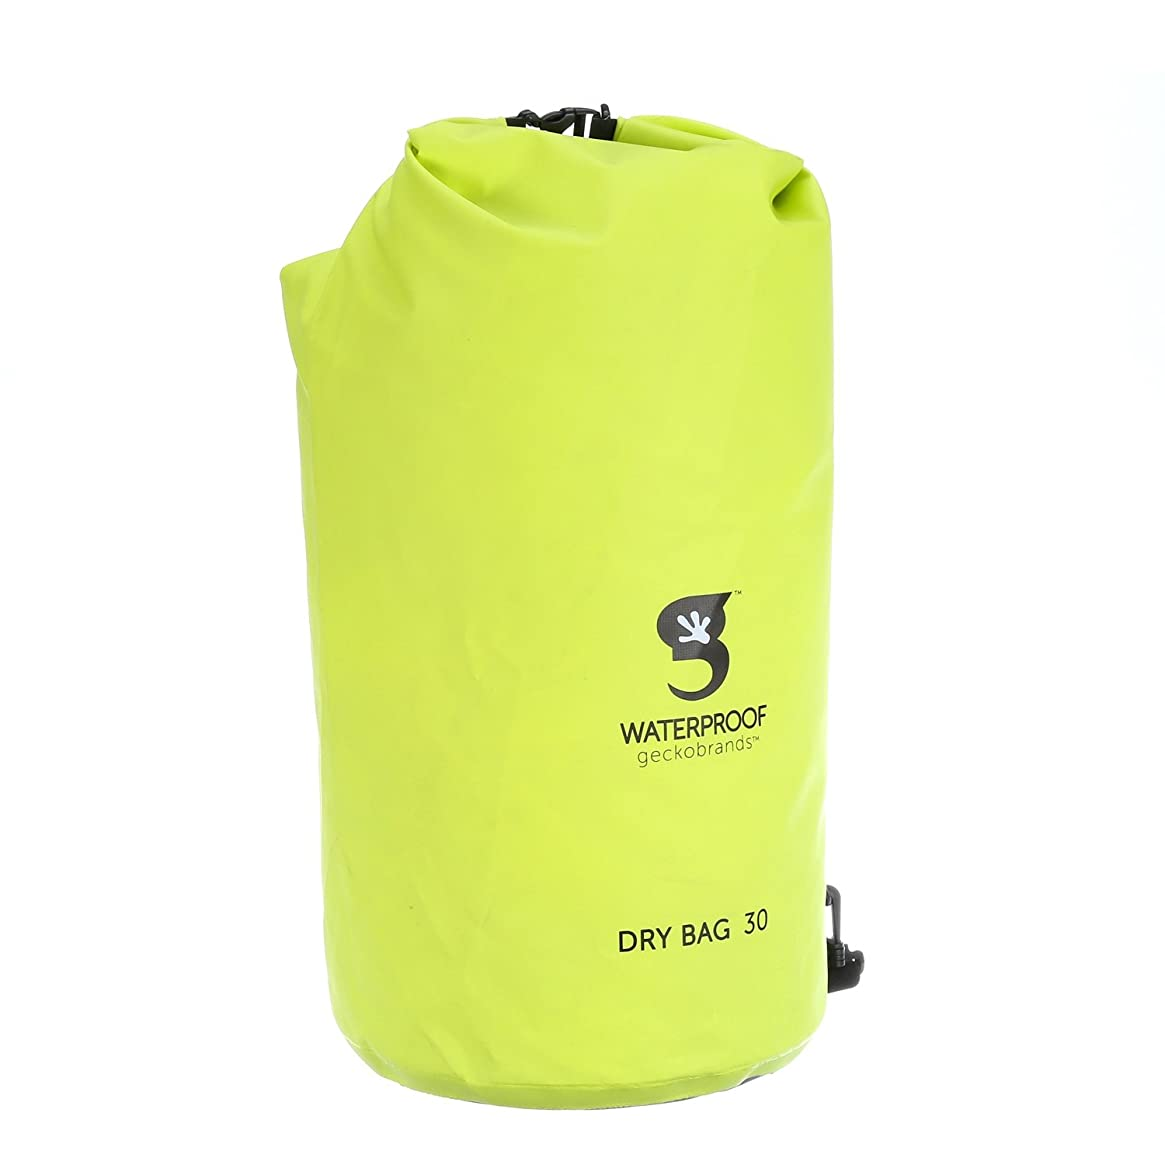 geckobrands Tarpaulin Dry Bag